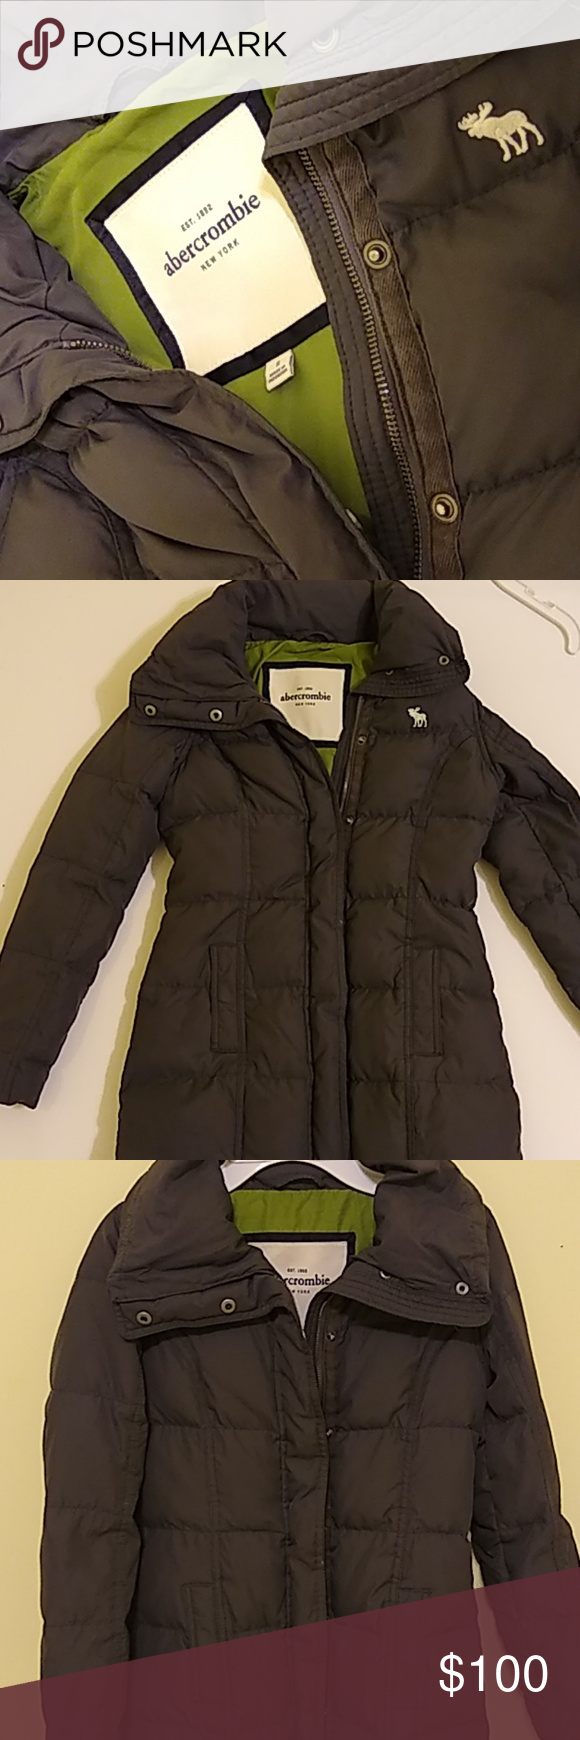 Abercrombie Finch Down Puffer Jacket Puffer Jackets Jackets Abercrombie [ 1740 x 580 Pixel ]